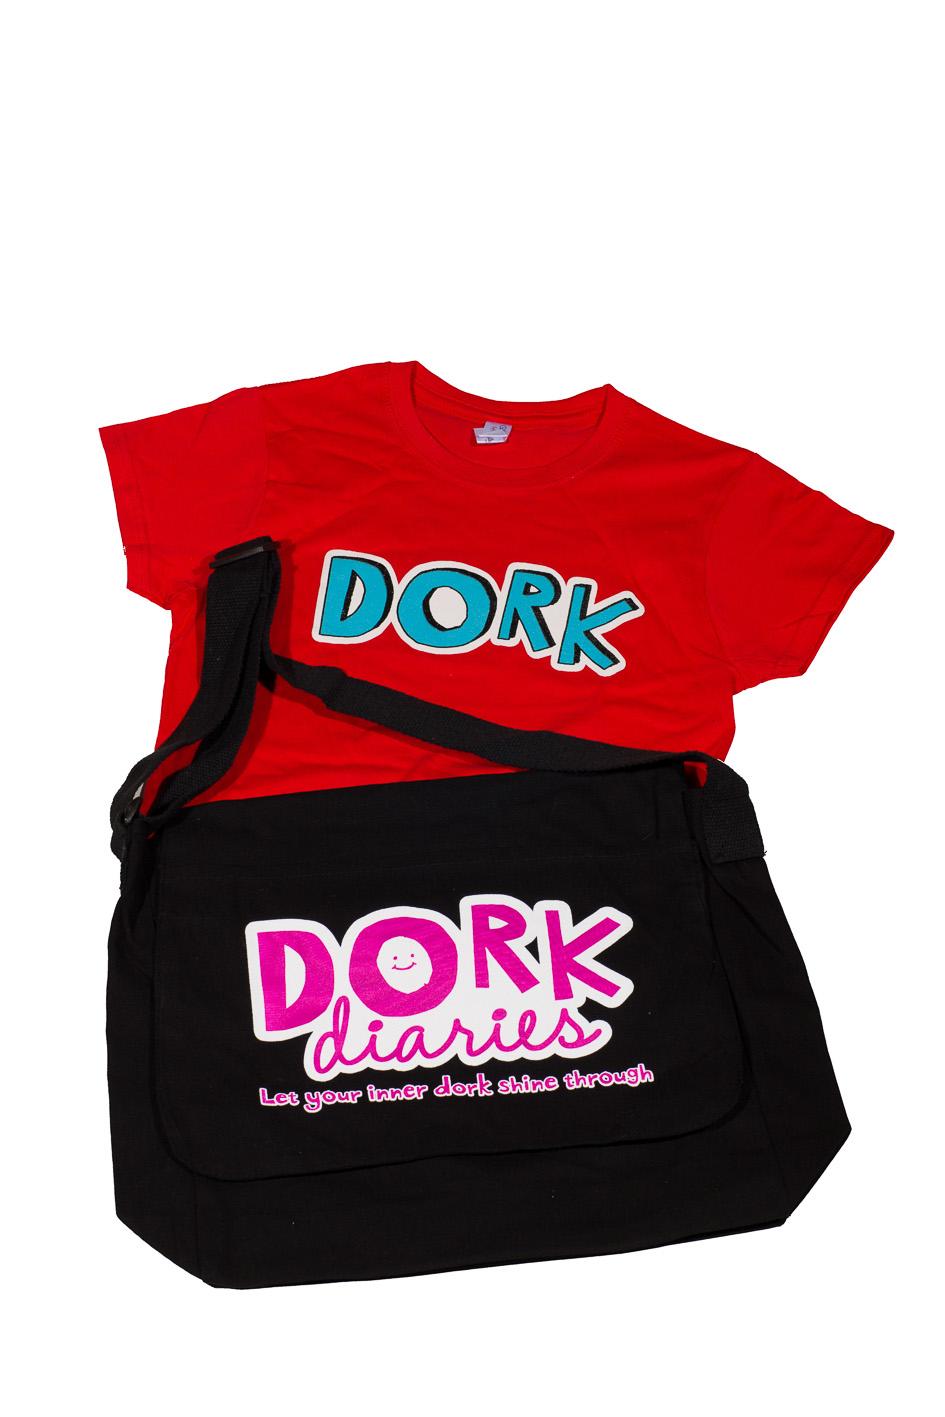 dork diaries pack tshirt front